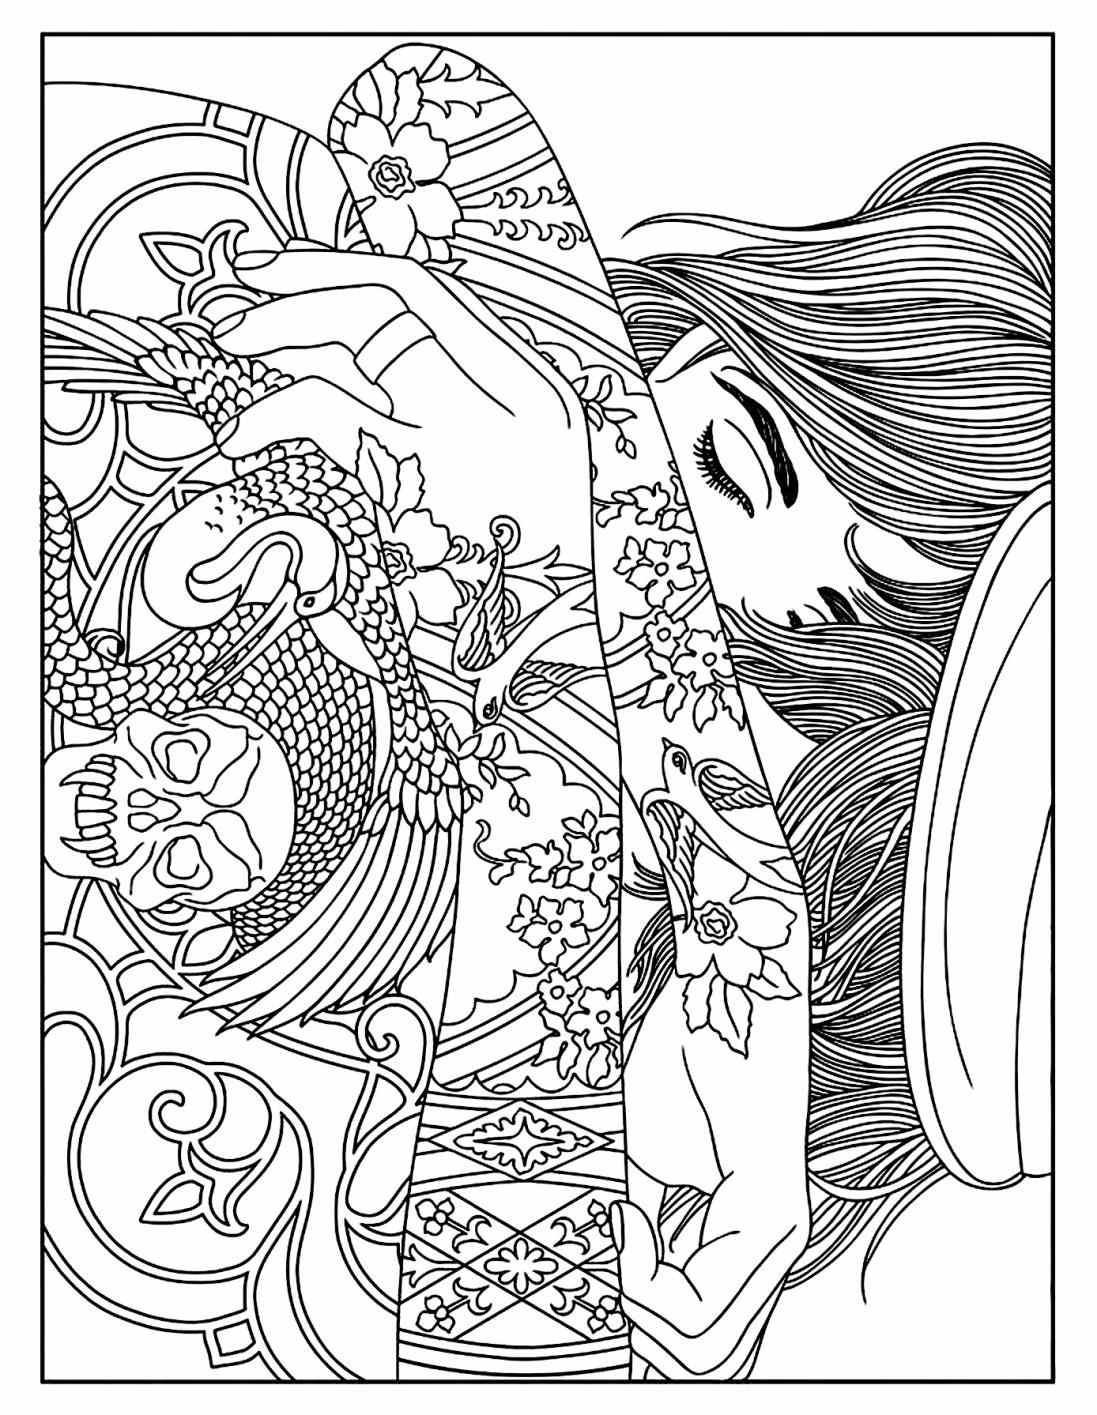 1097x1415 Landscape Celine Landscapes Coloring Pages For Adults Justcolor